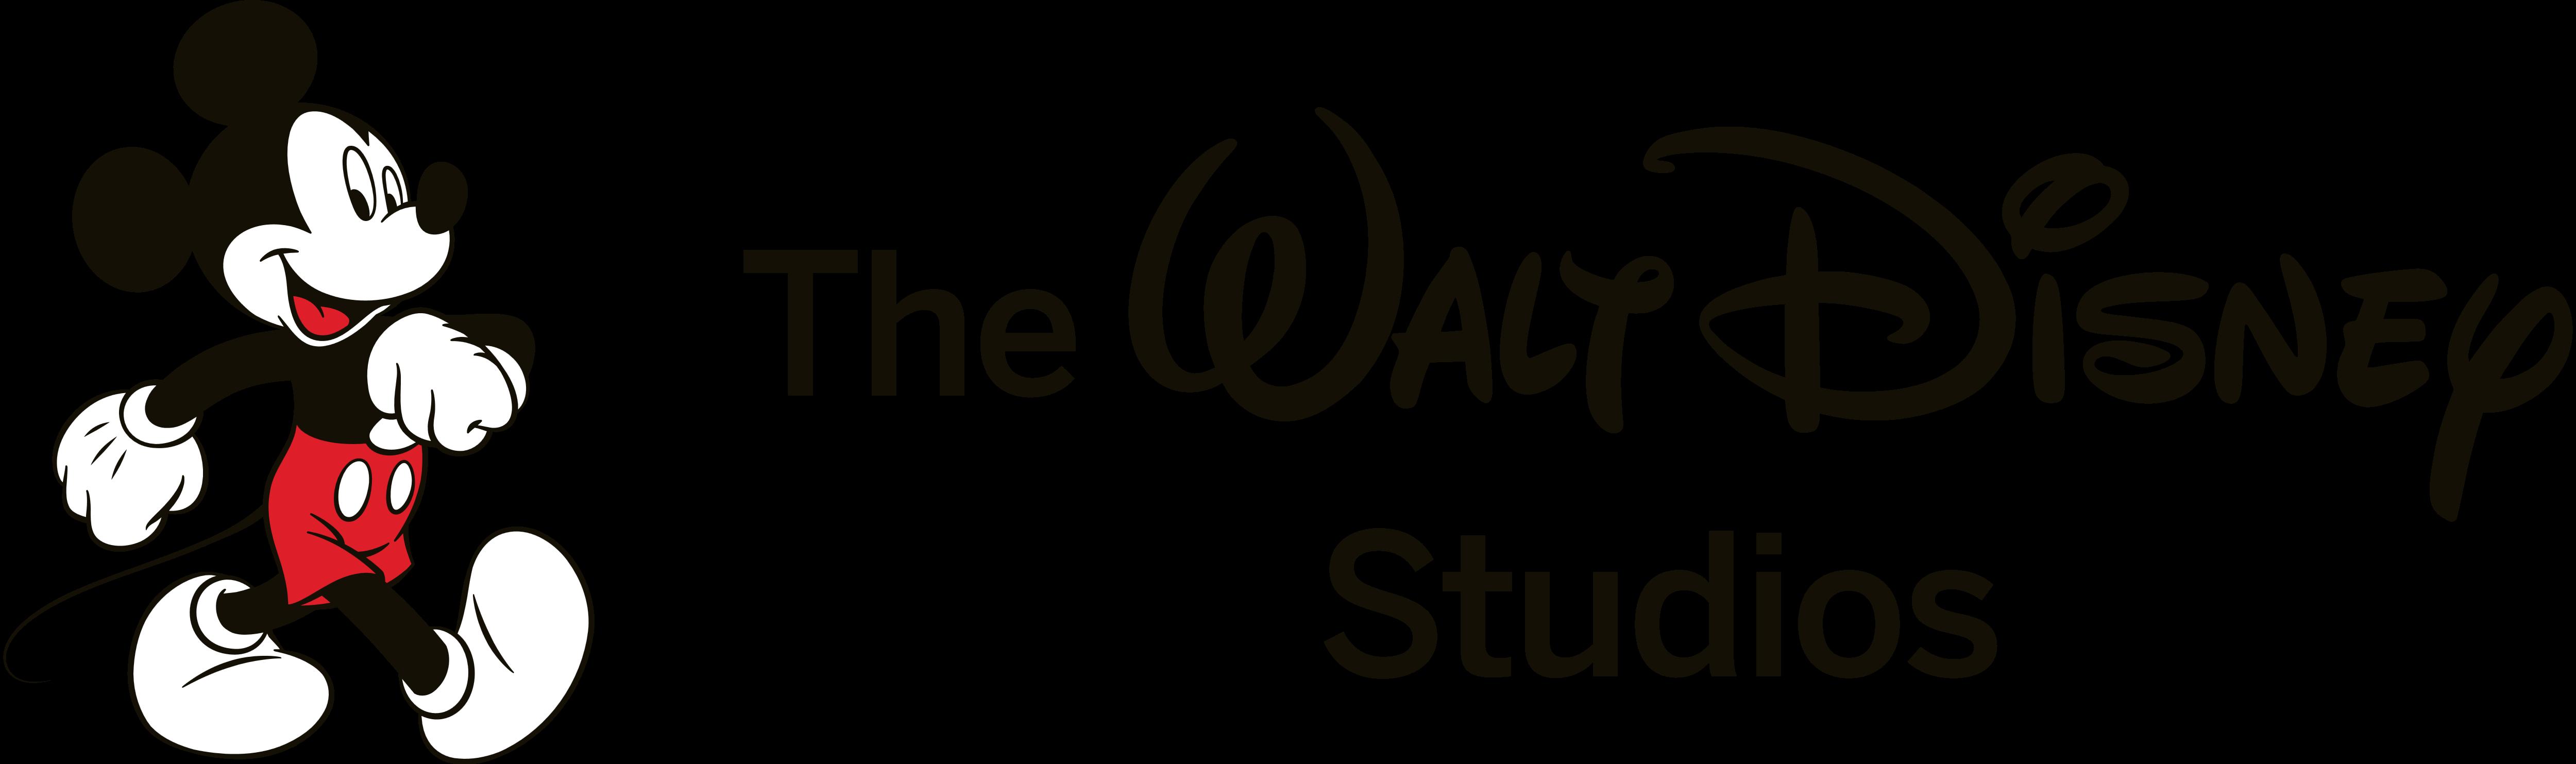 Walt disney pictures png logo free transparent png logos the walt disney studios png logo 4461 biocorpaavc Choice Image